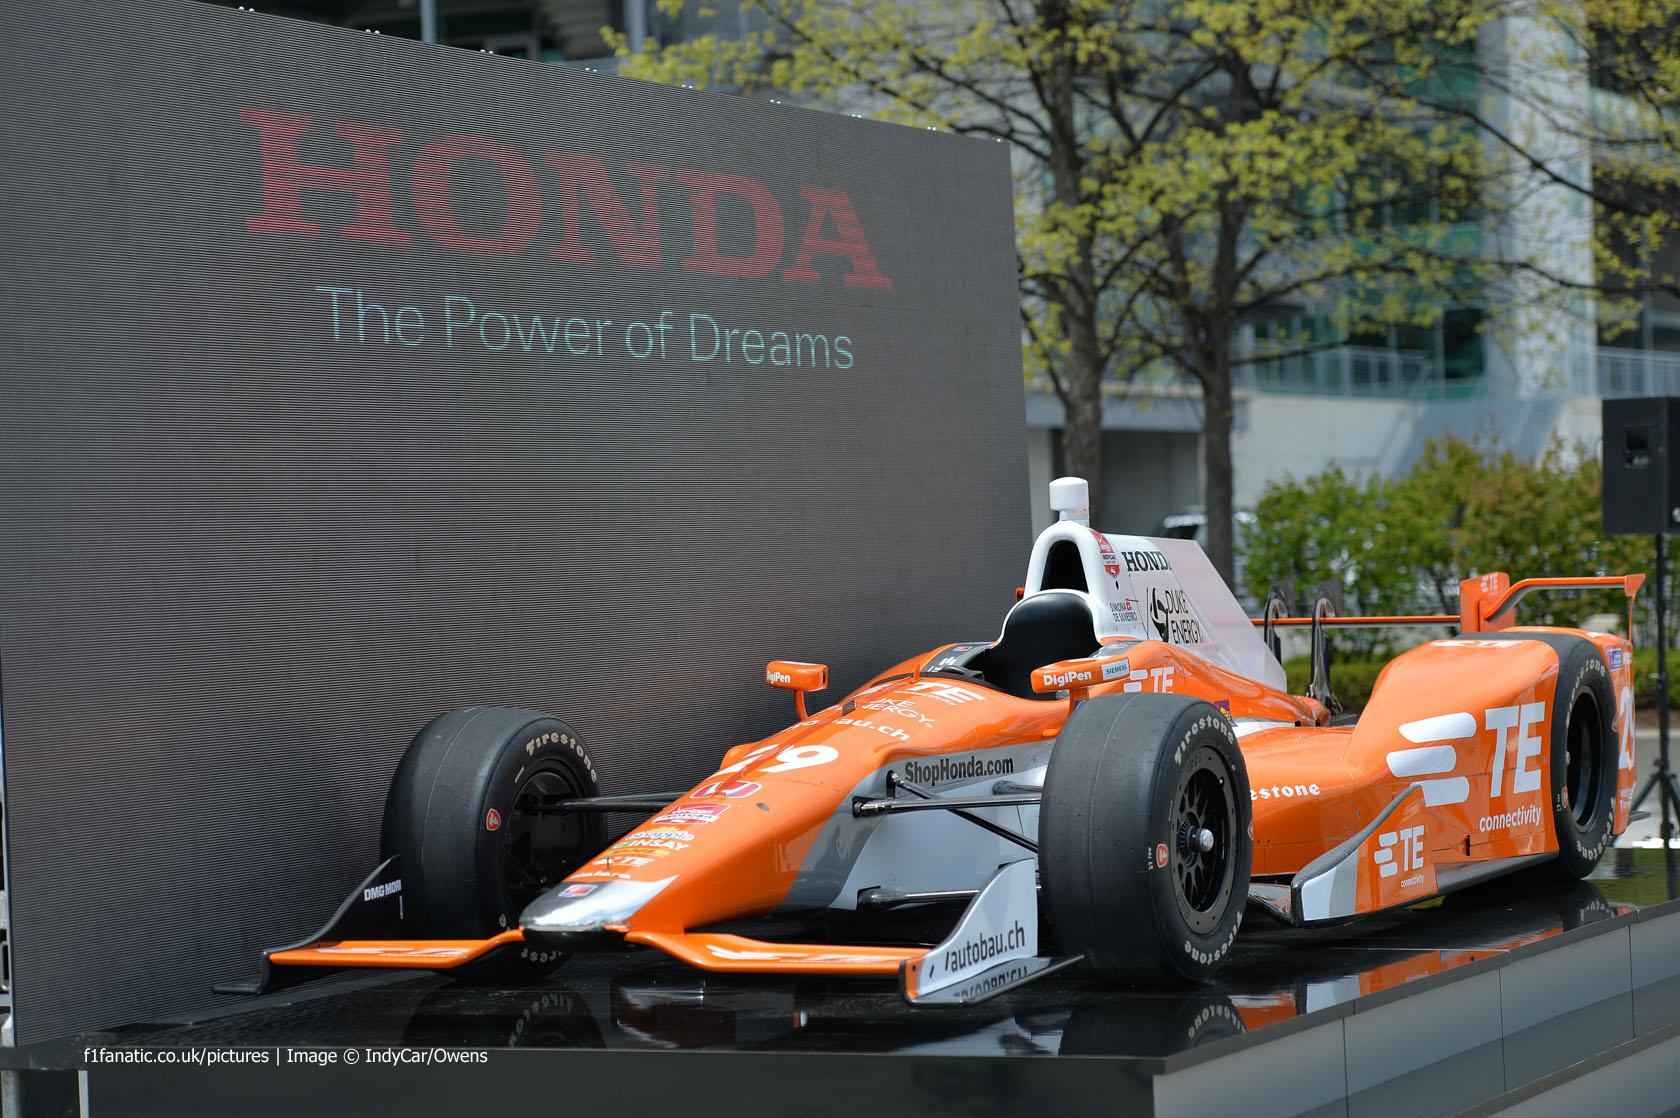 Honda Indycar Speedway Aero